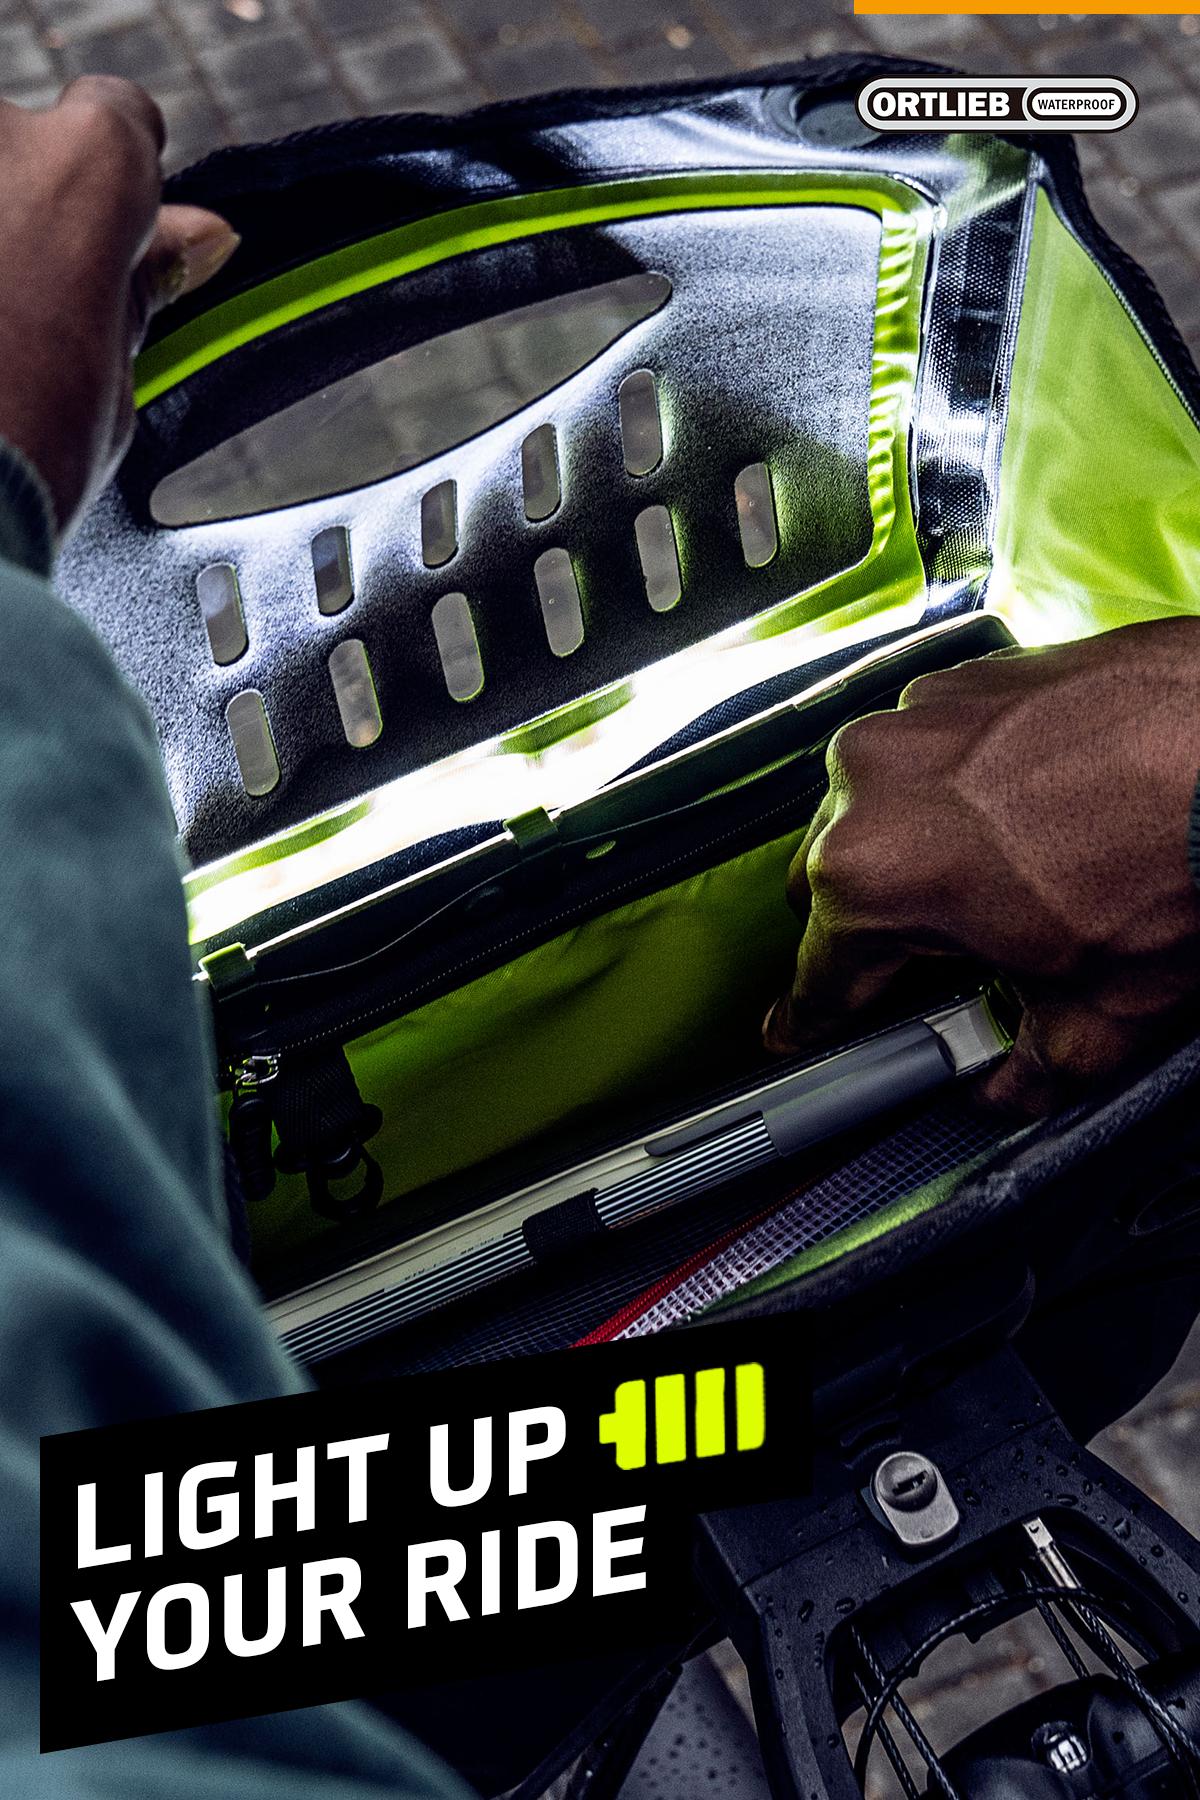 E Glow Your Perfect E Bike Bag In 2020 Lenkertasche Taschen